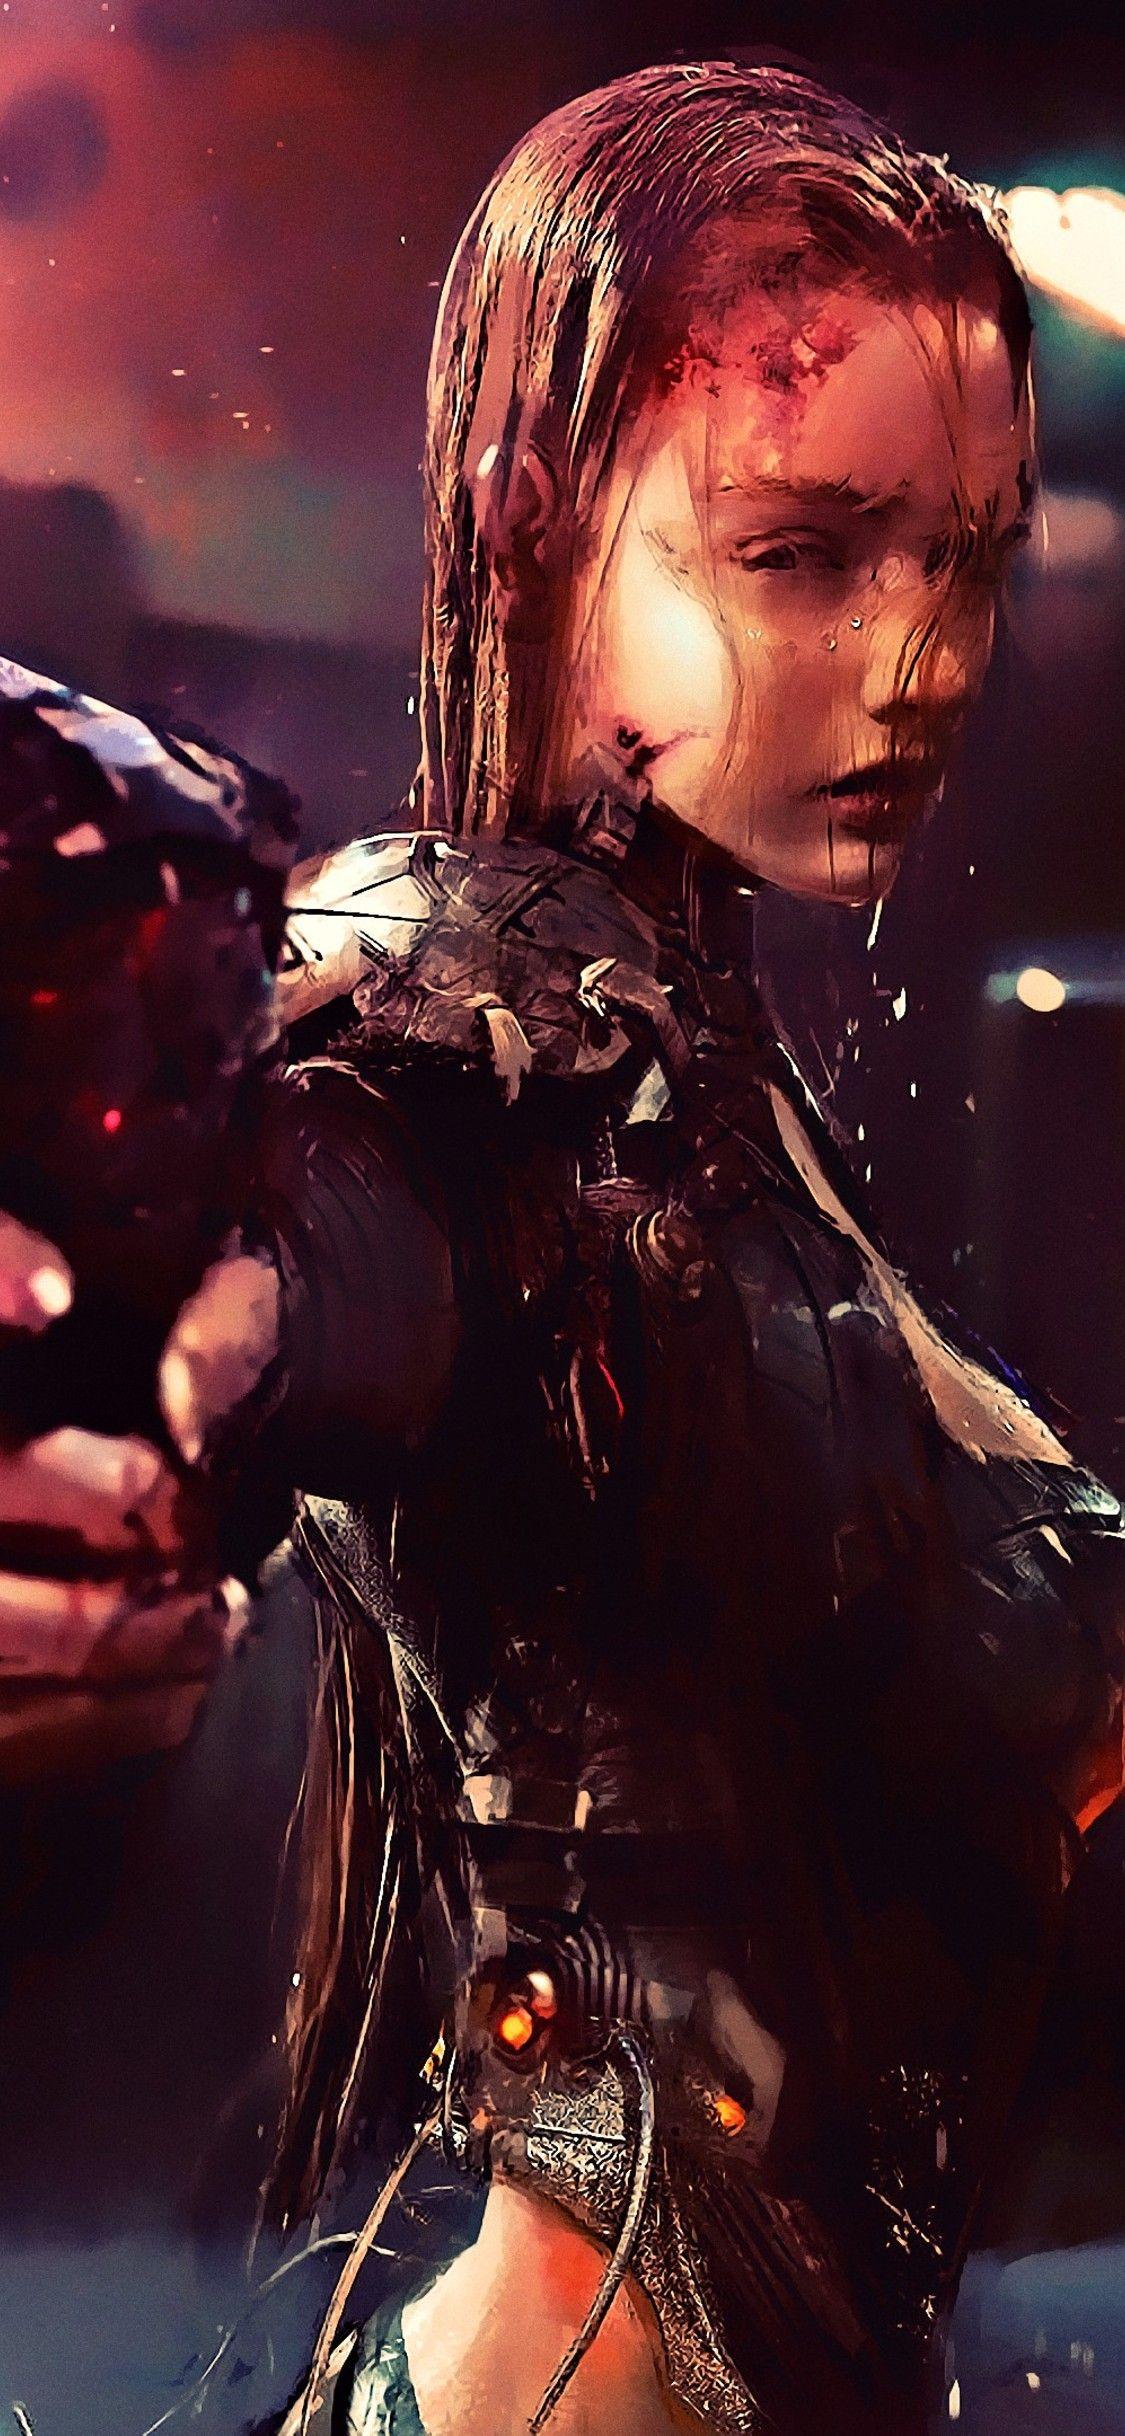 Warrior Girl Cyberpunk Futuristic Artwork Iphone X